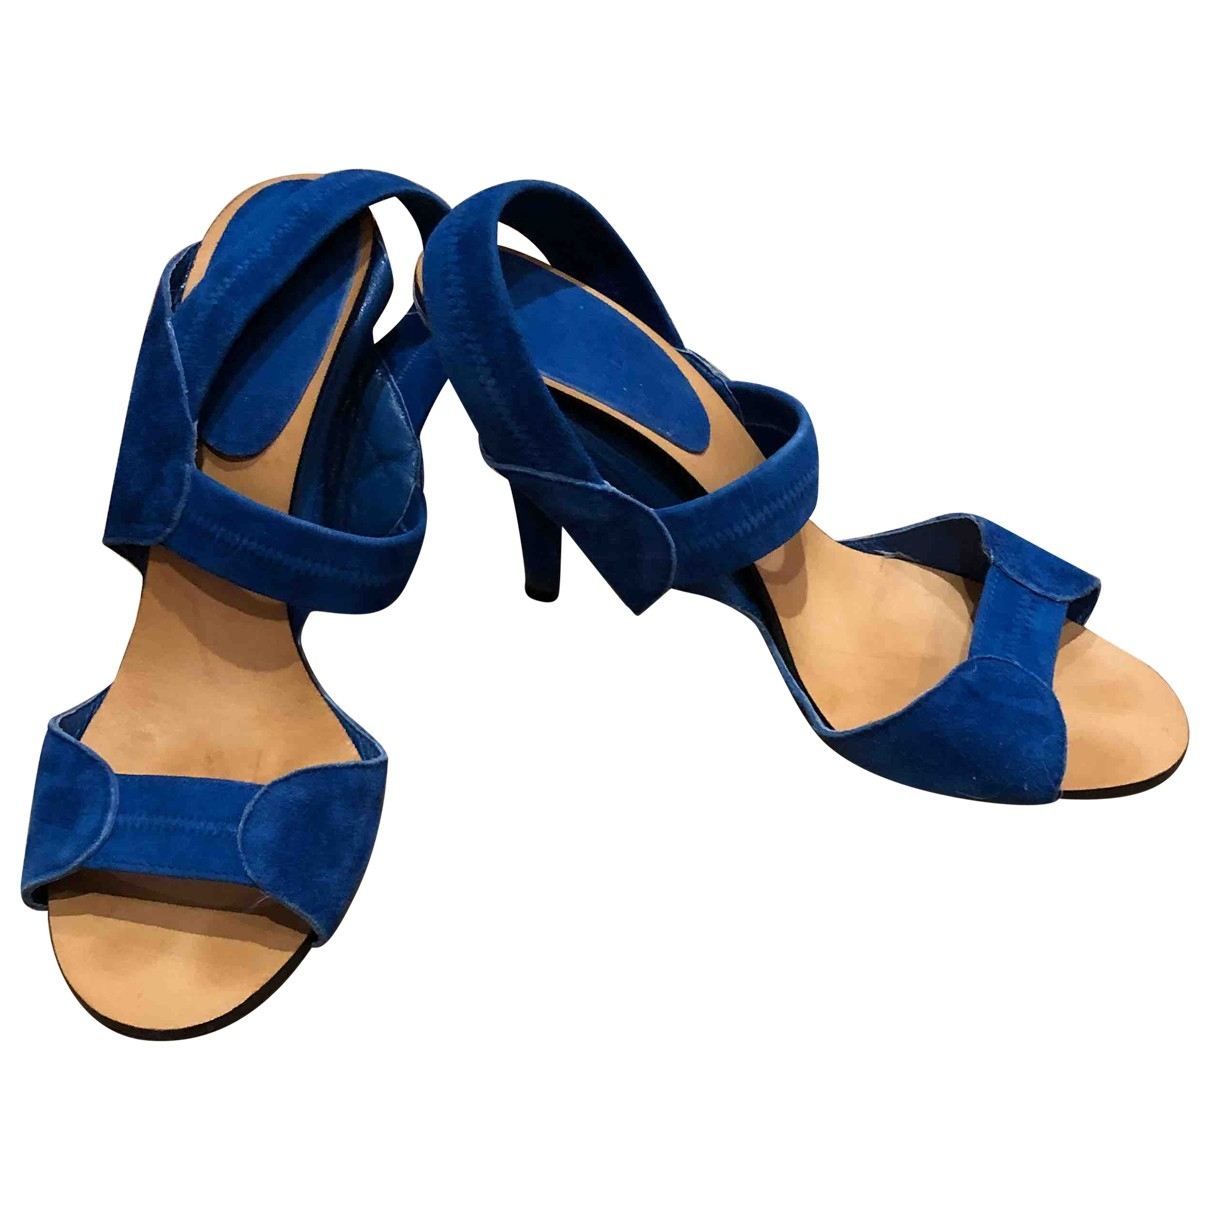 Chloé \N Blue Suede Sandals for Women 39.5 EU